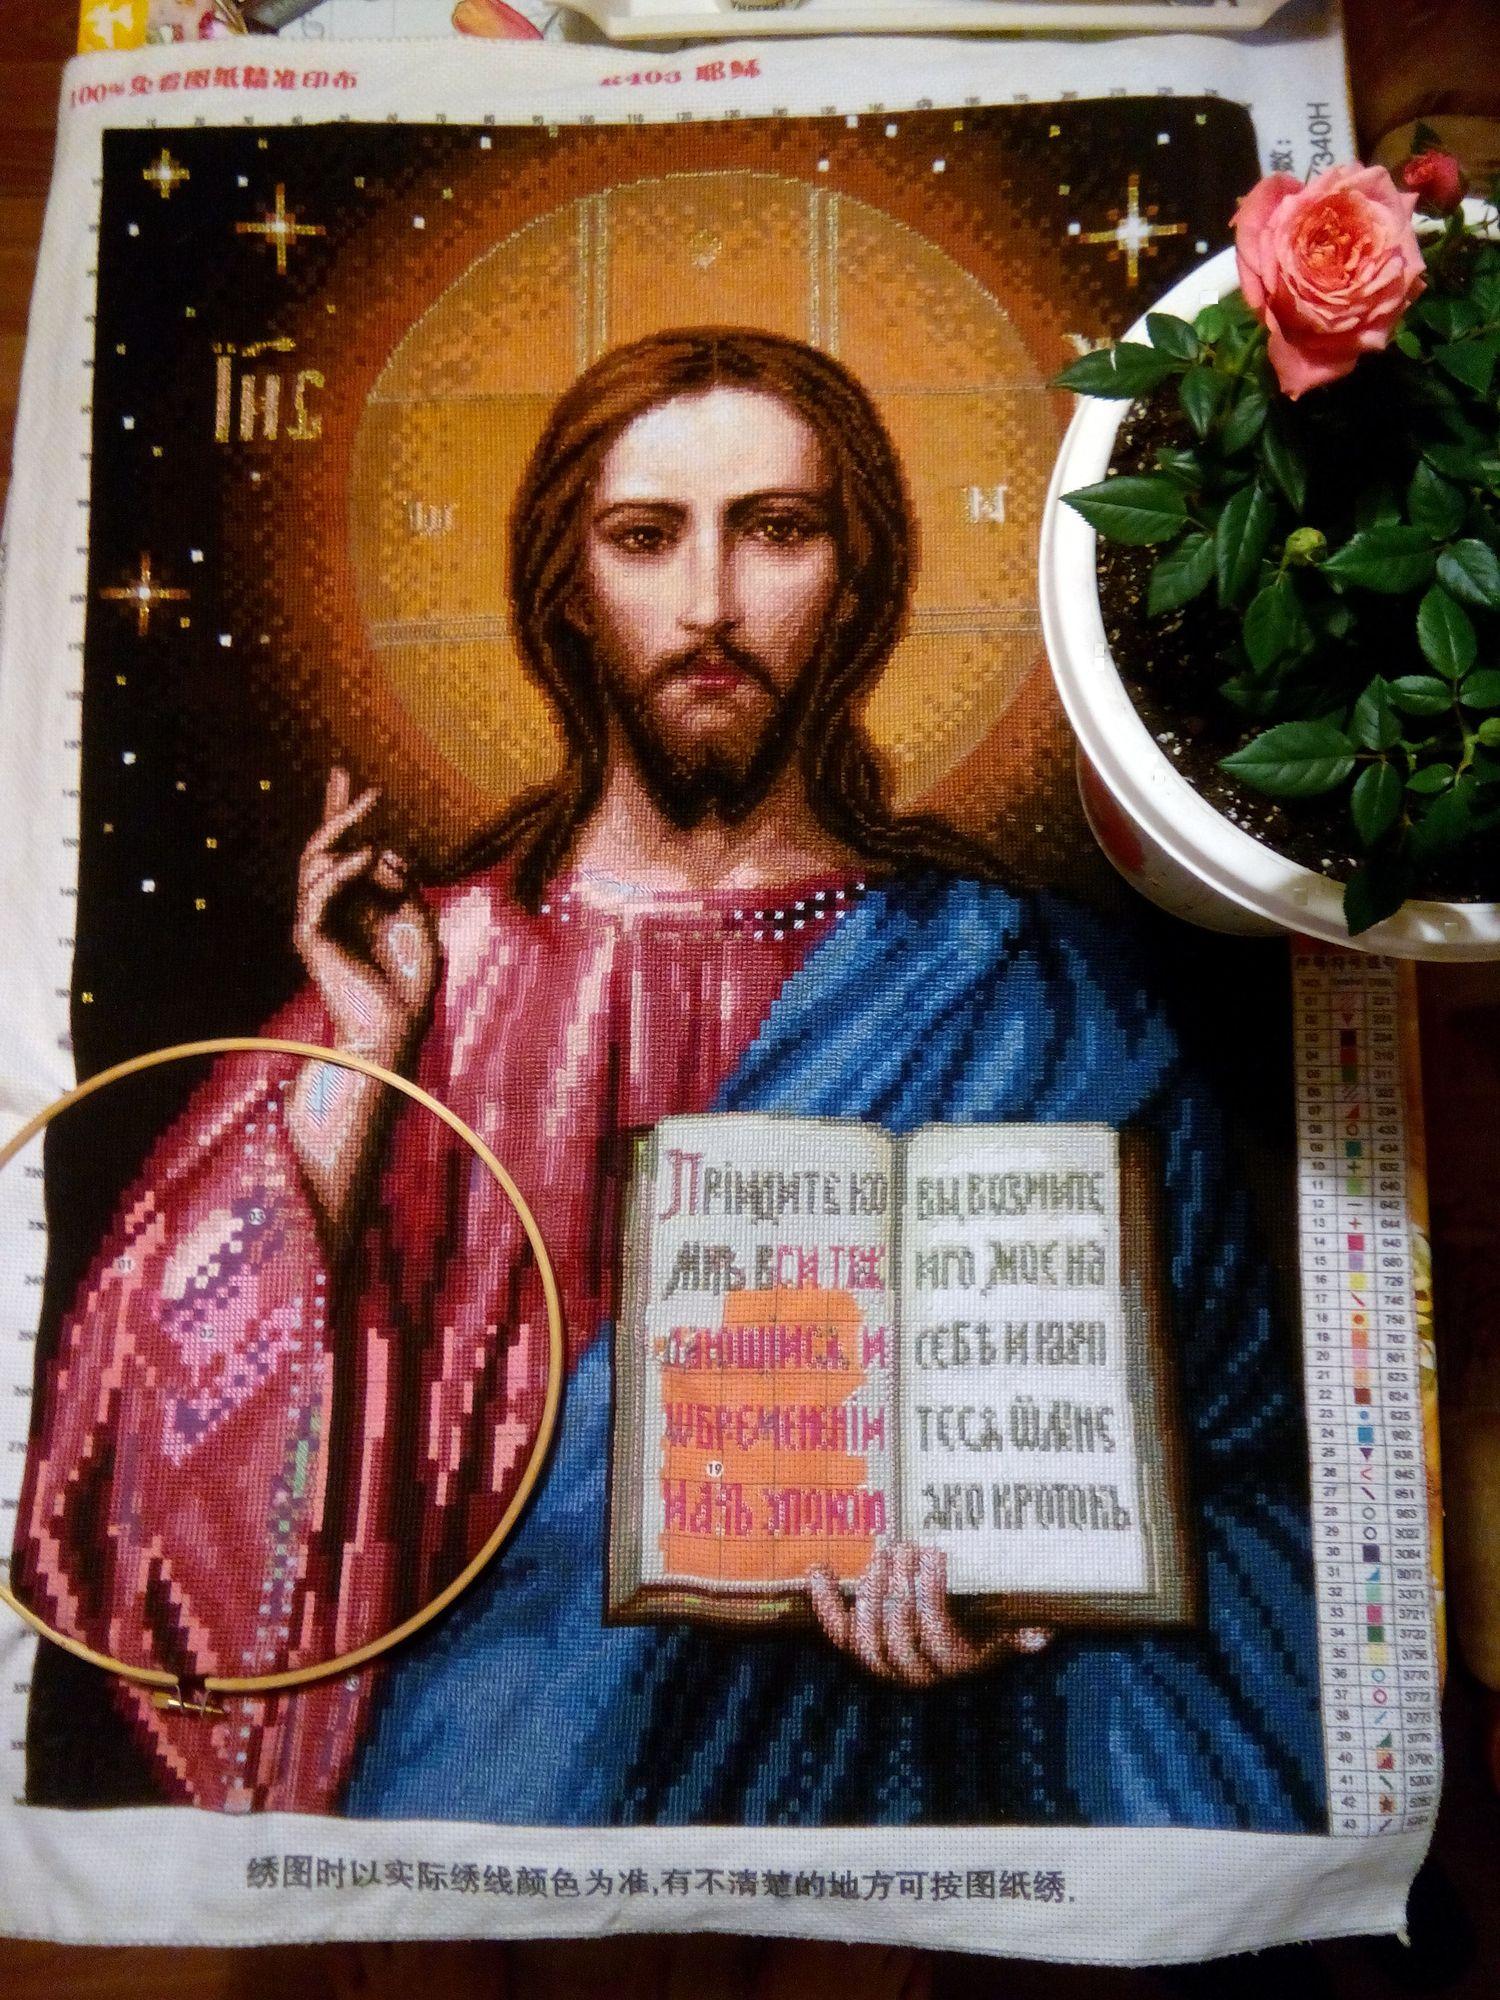 Господи Иисусе Христе, Сыне Божий, помилуй мя грешного.